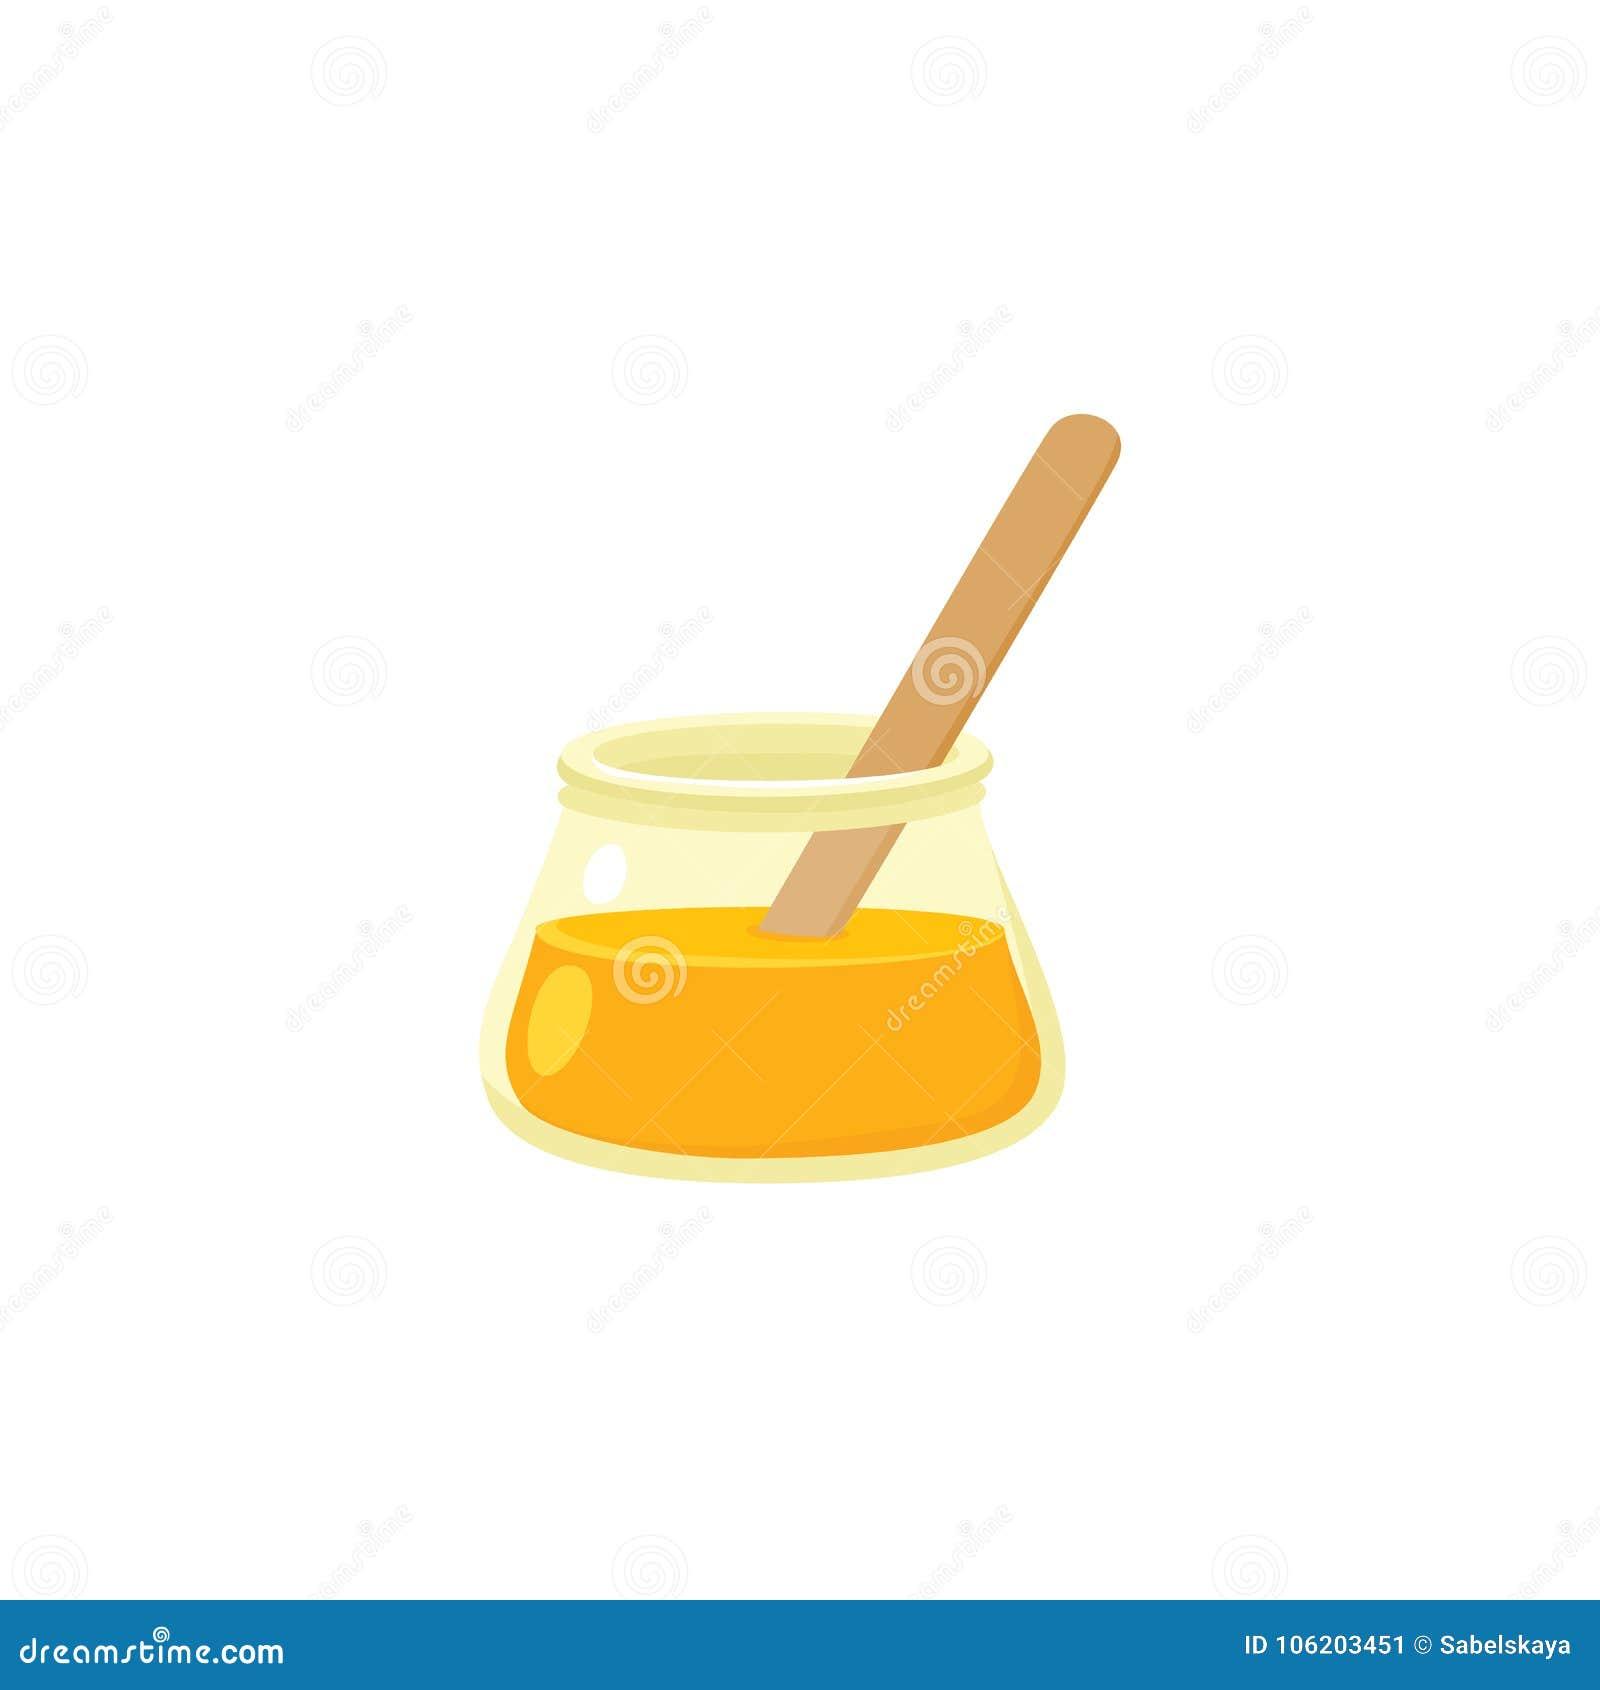 Ícone liso de adoçar a pasta, açúcar que encera o conceito